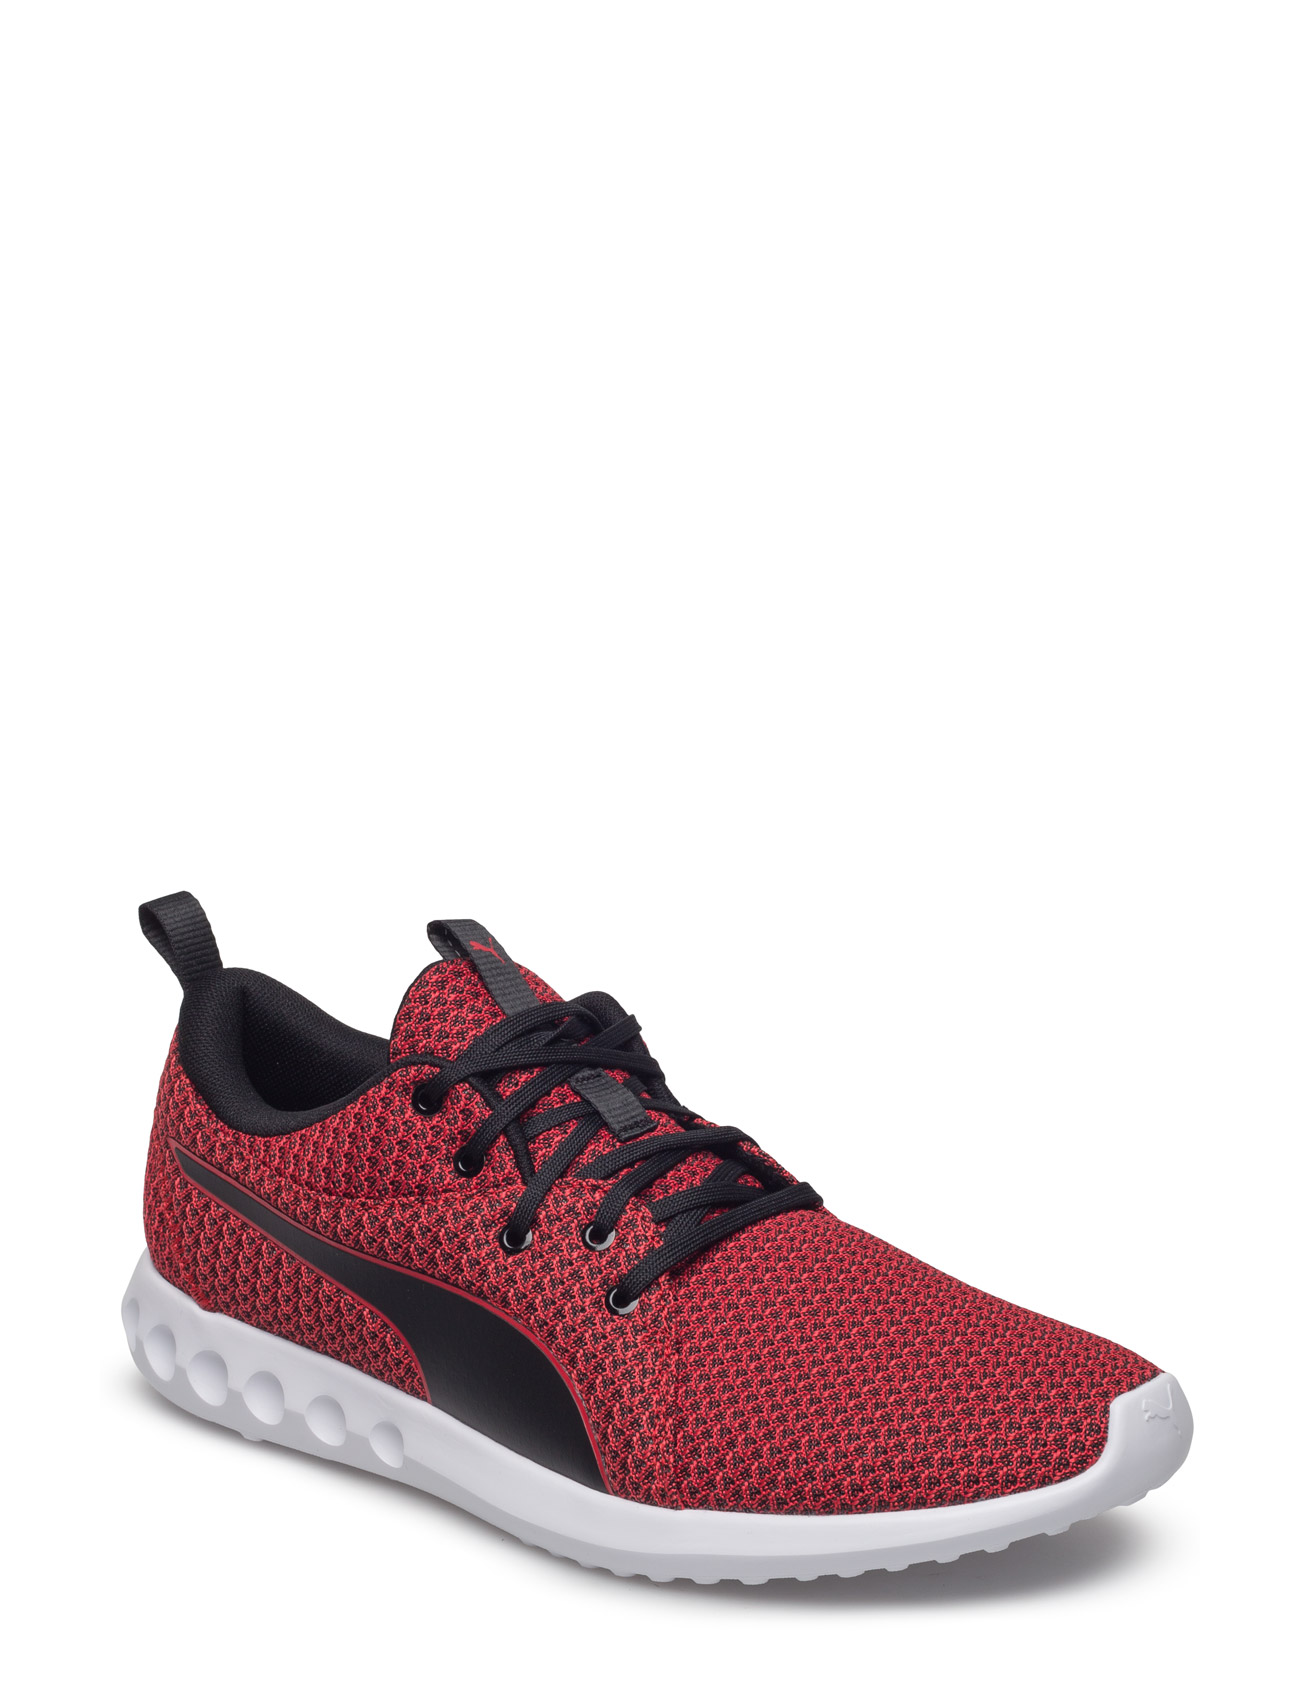 Carson 2 Knit PUMA SPORT Sports sko til Herrer i